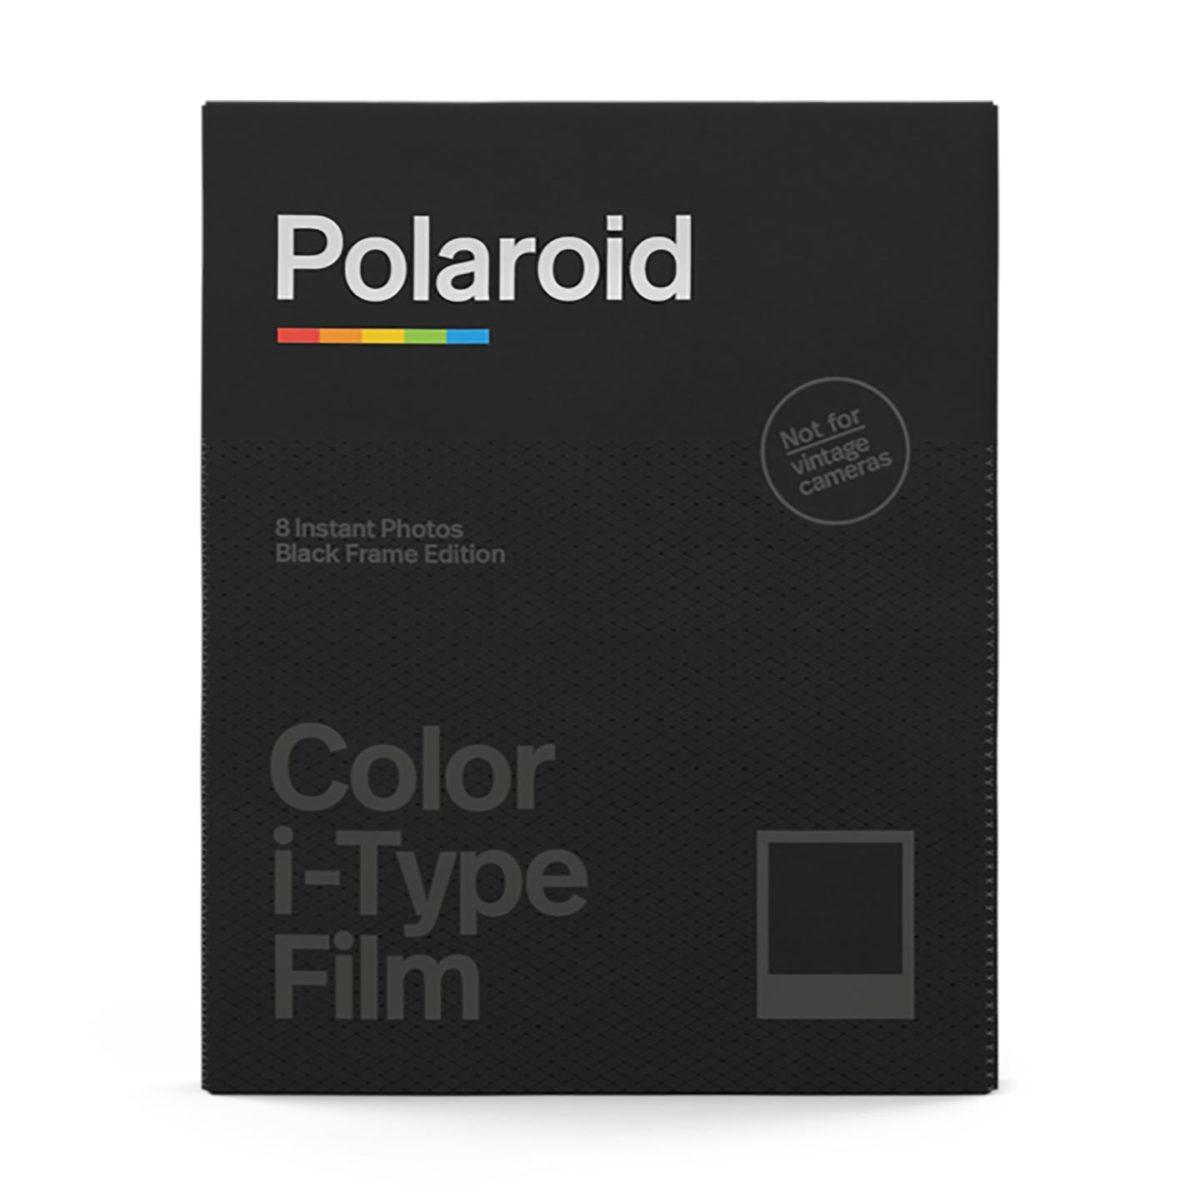 polaroid_i_type_color_film_black_frame_02